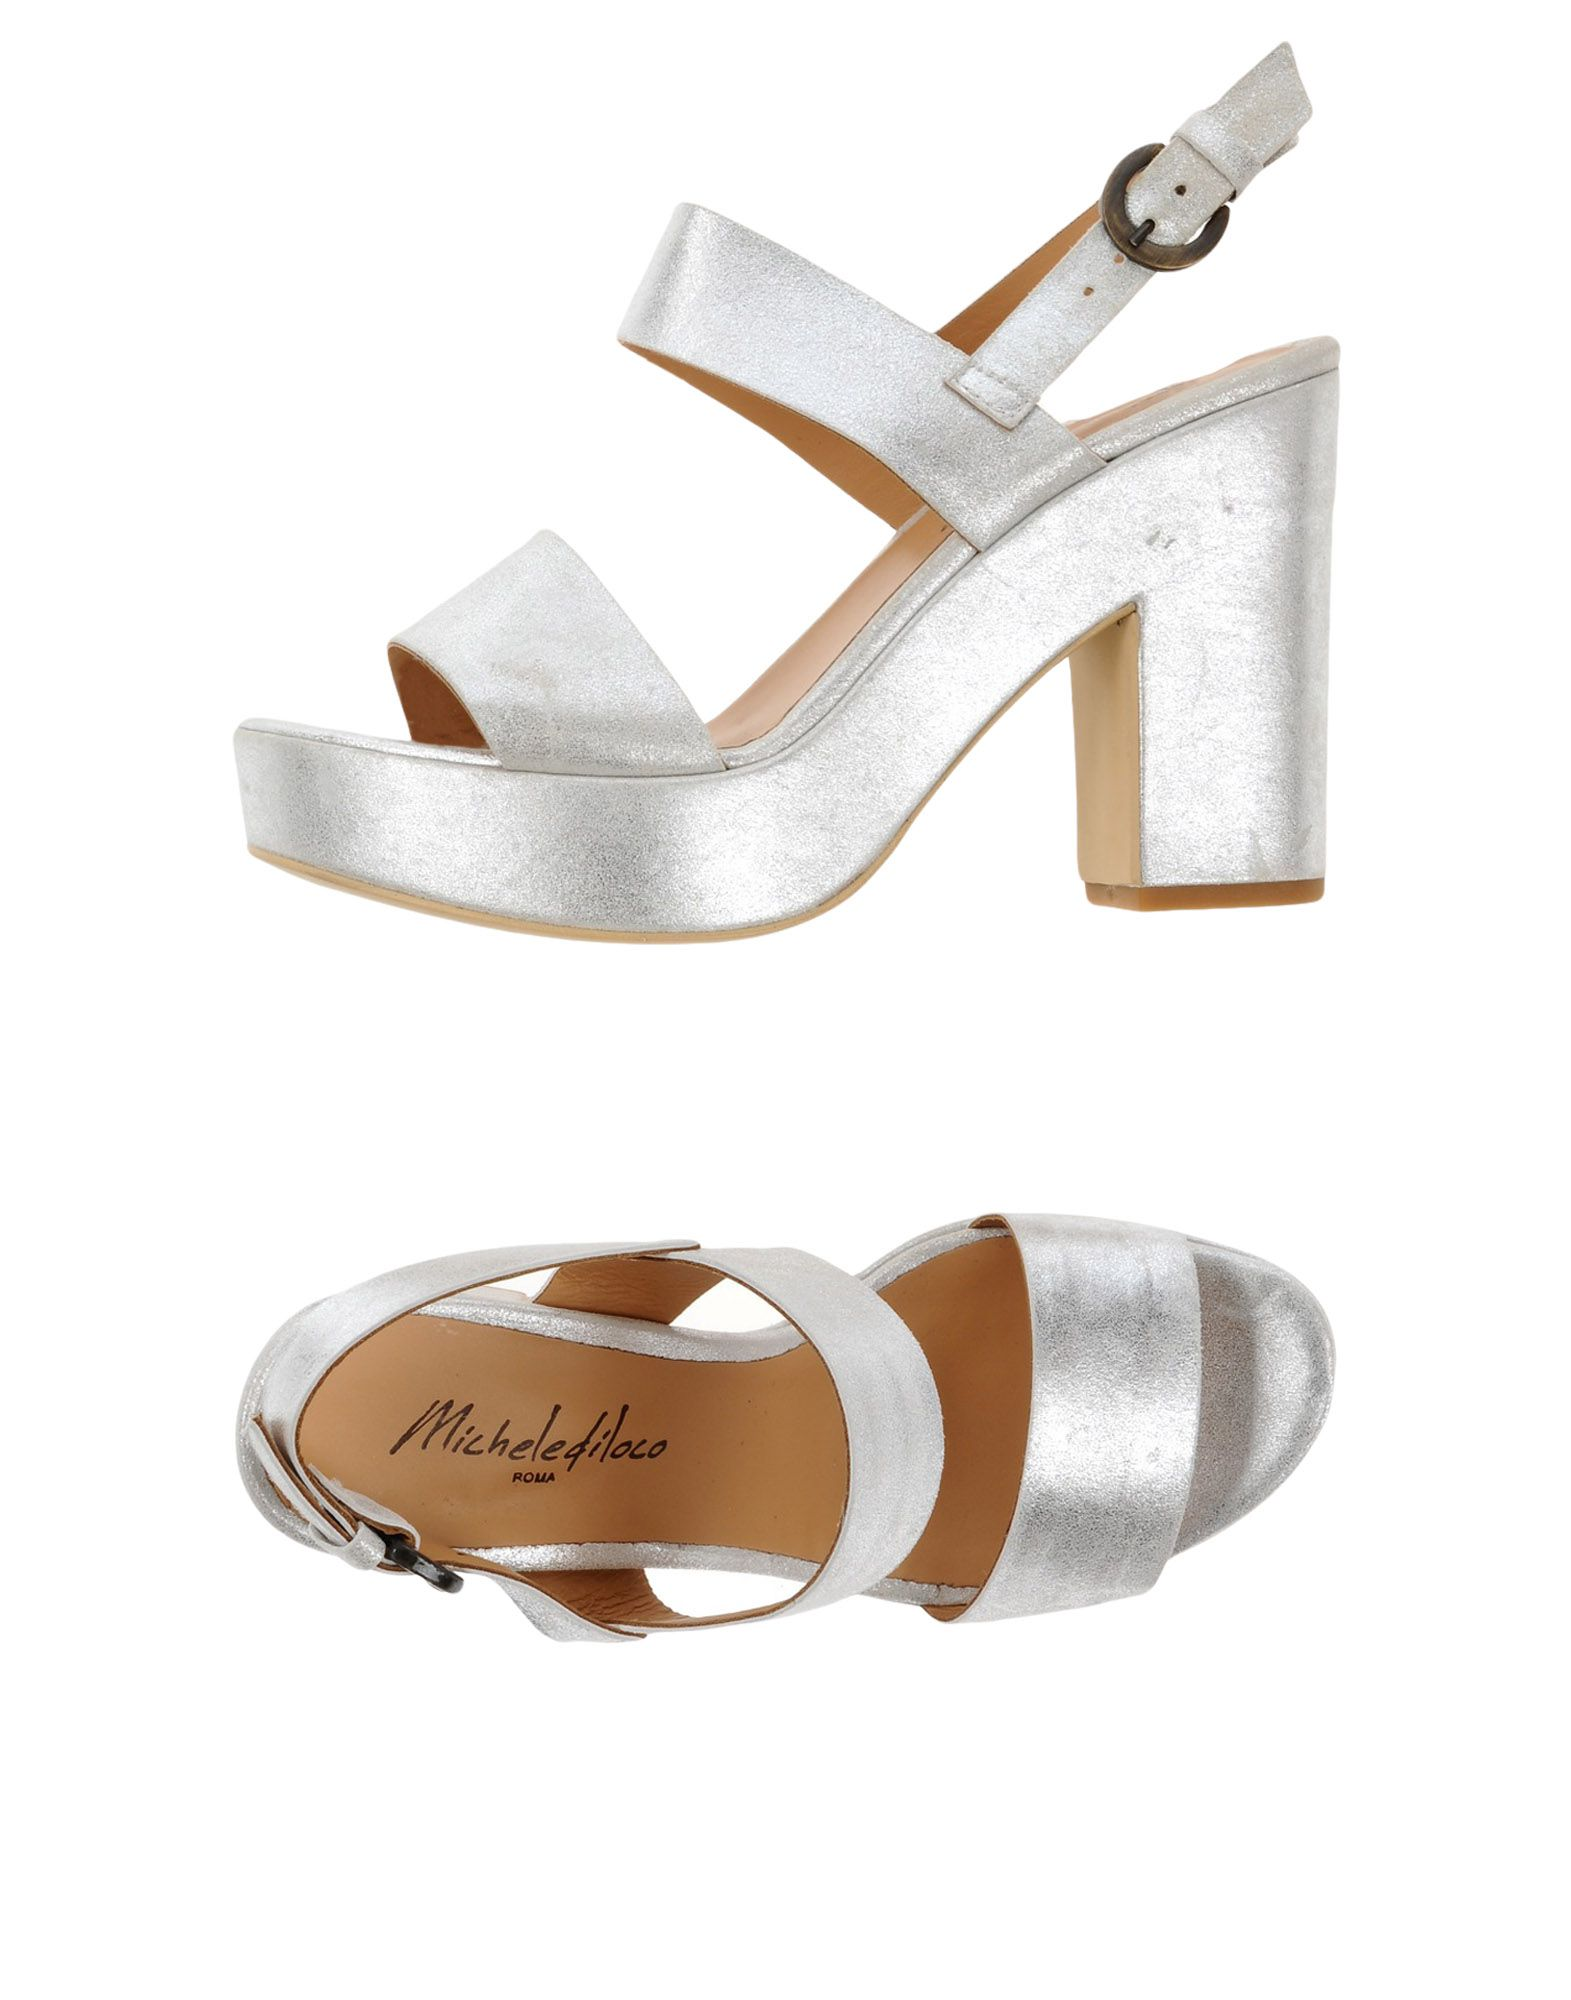 Michelediloco Sandalen beliebte Damen  11376894OD Gute Qualität beliebte Sandalen Schuhe 1be534